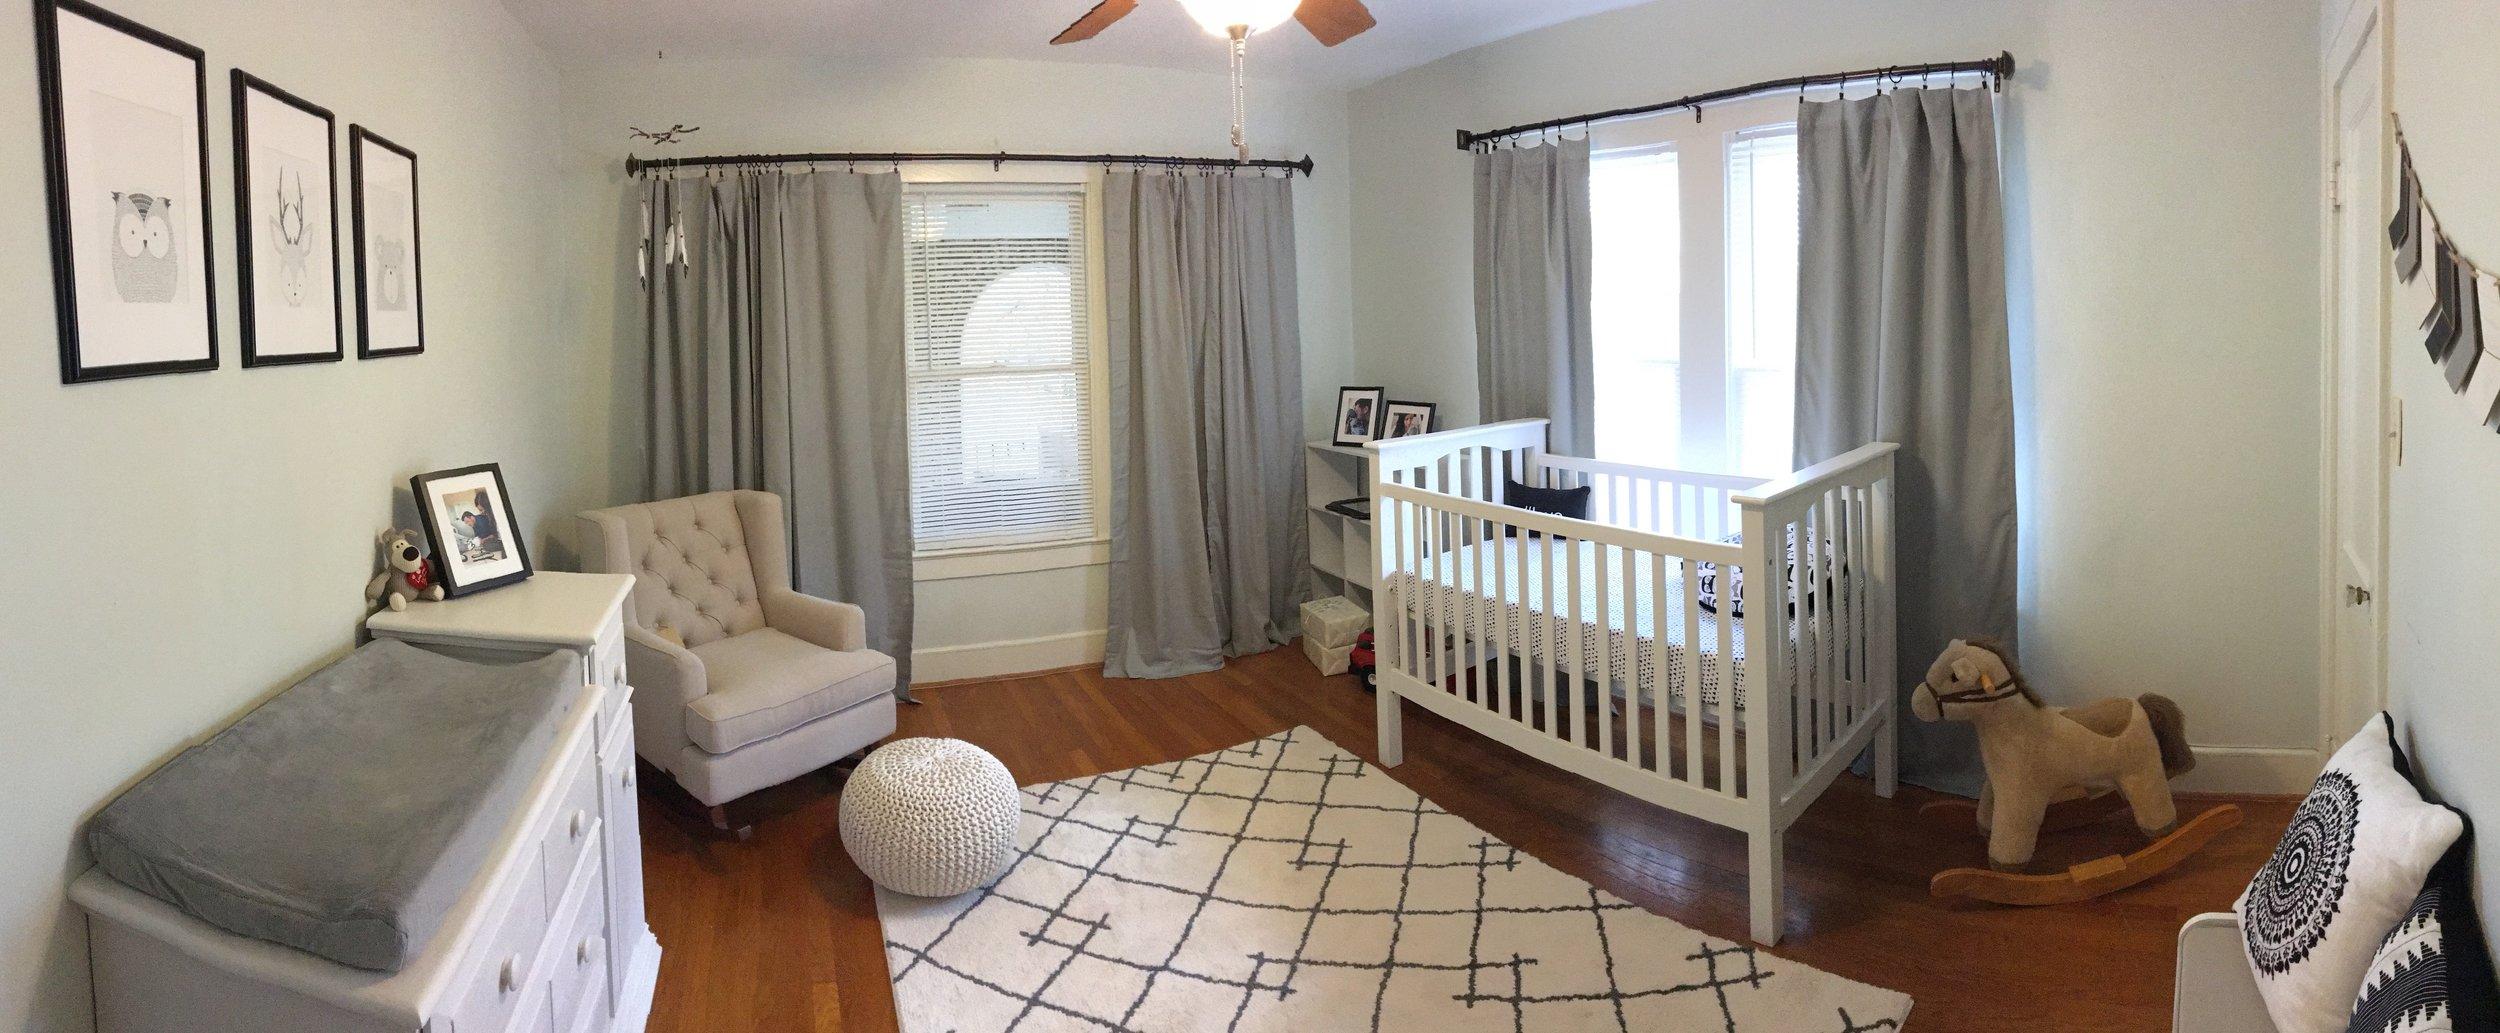 Wall Nursery.jpg